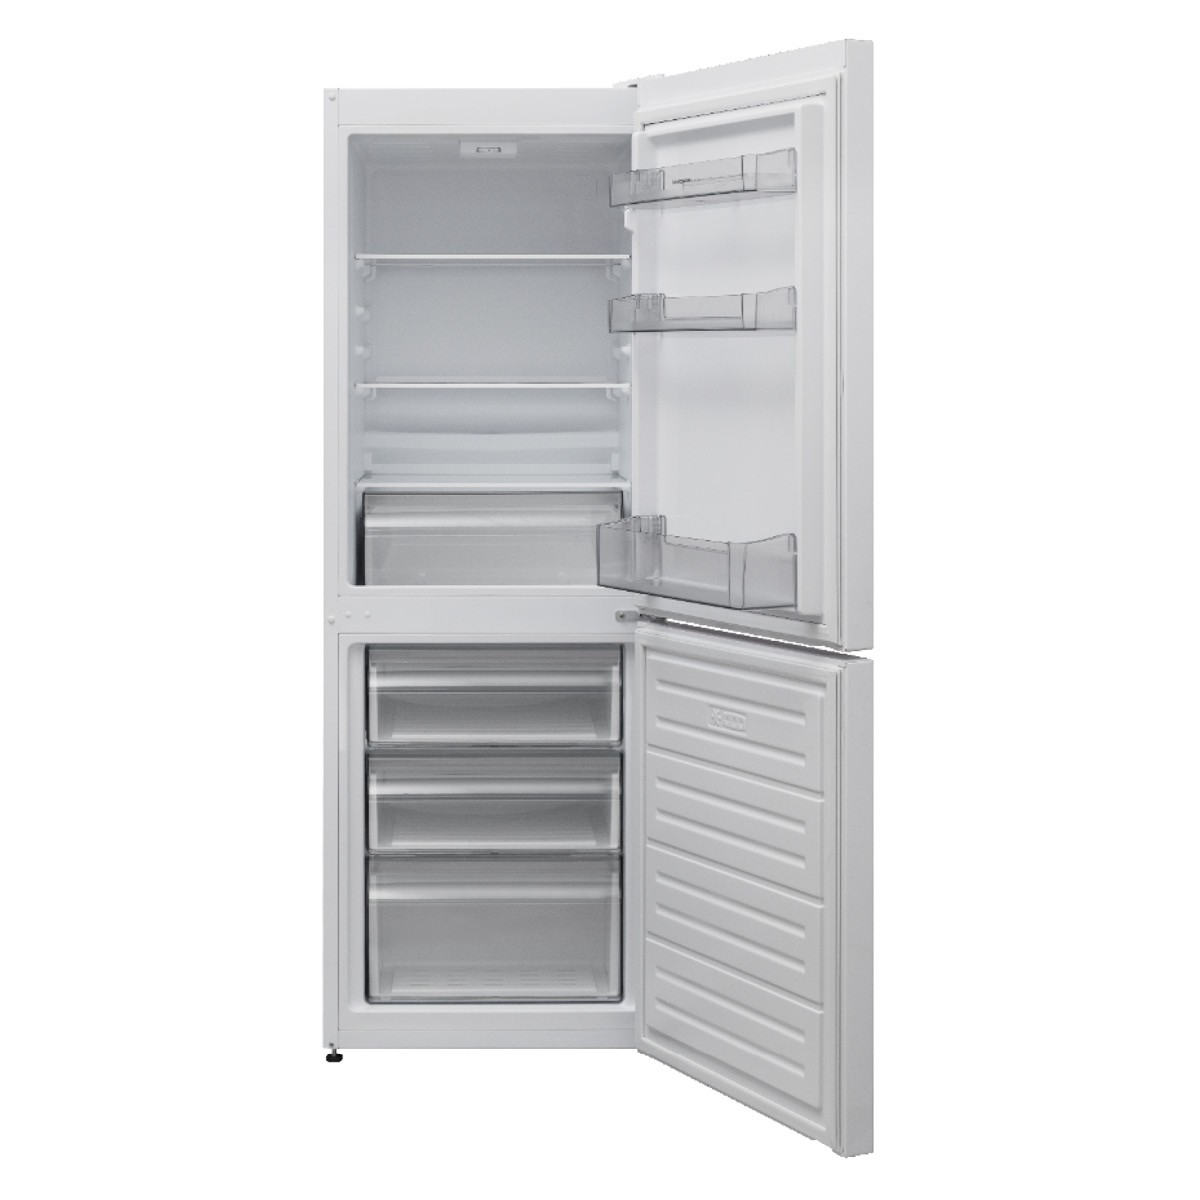 Montpellier MFF155W Fridge Freezer